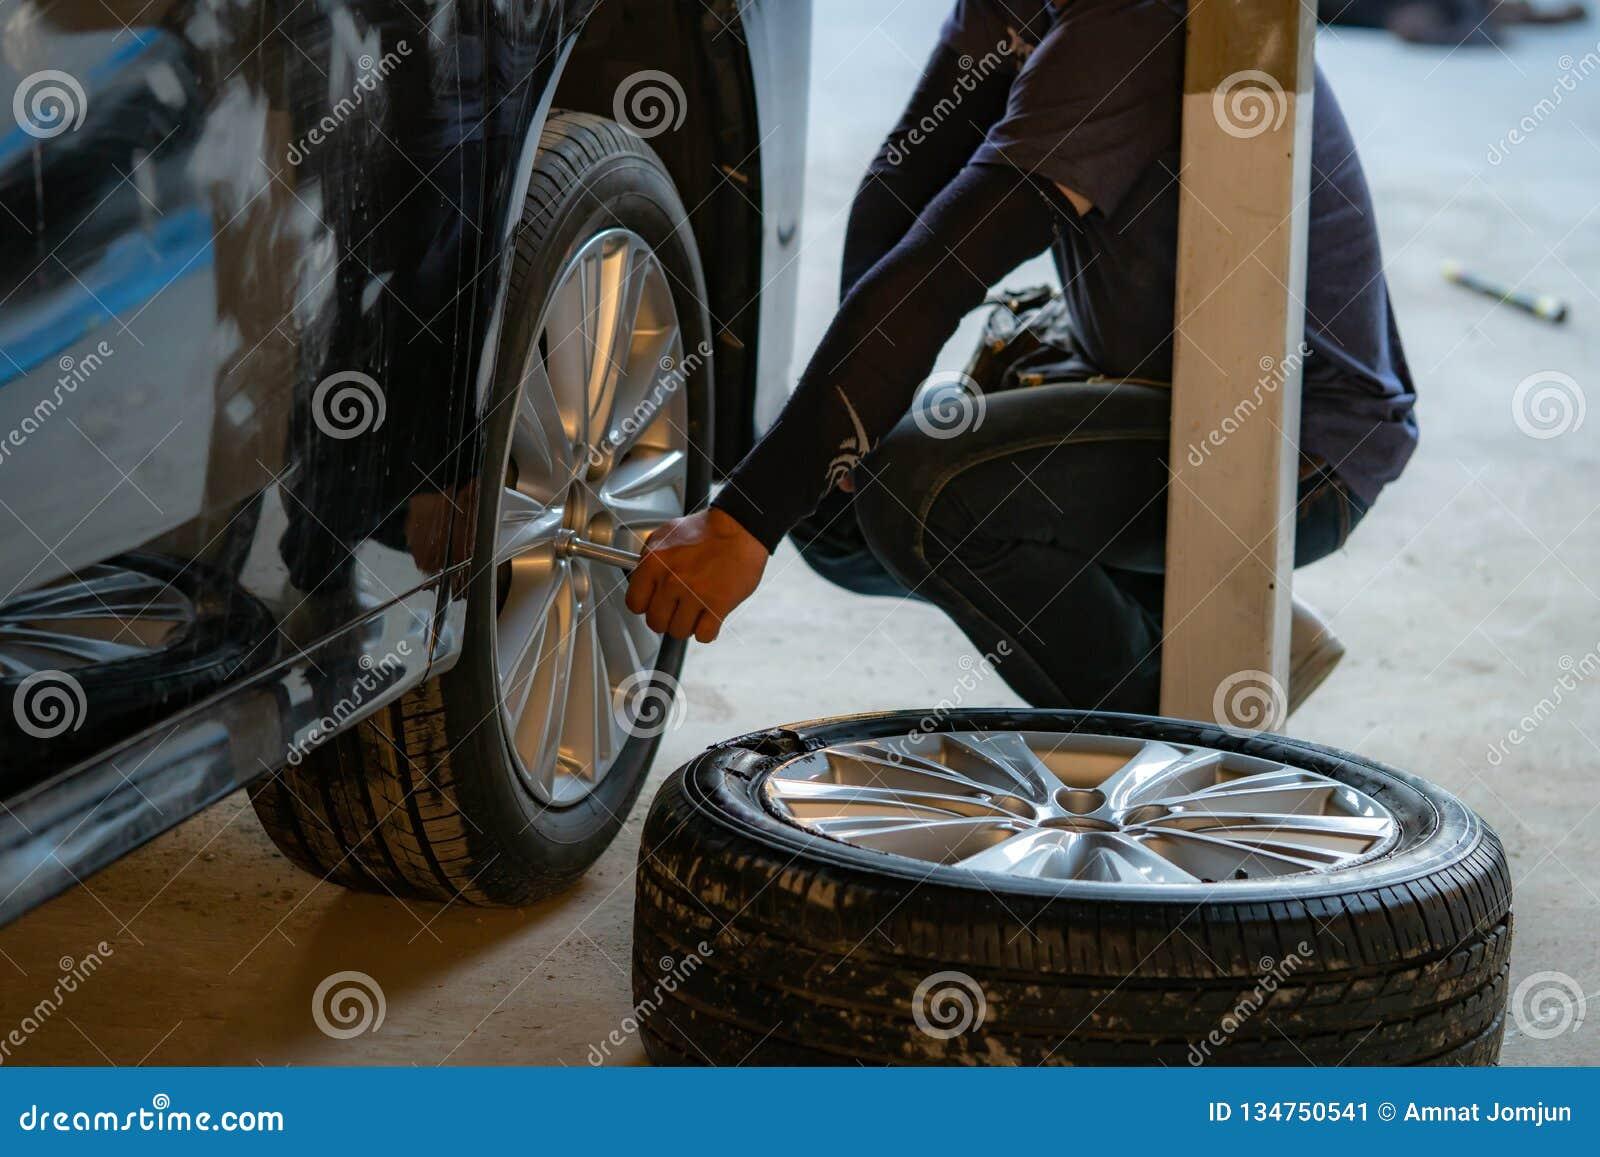 Svart bil, brutet hjul, gummihjulbristning, brutet gummihjul